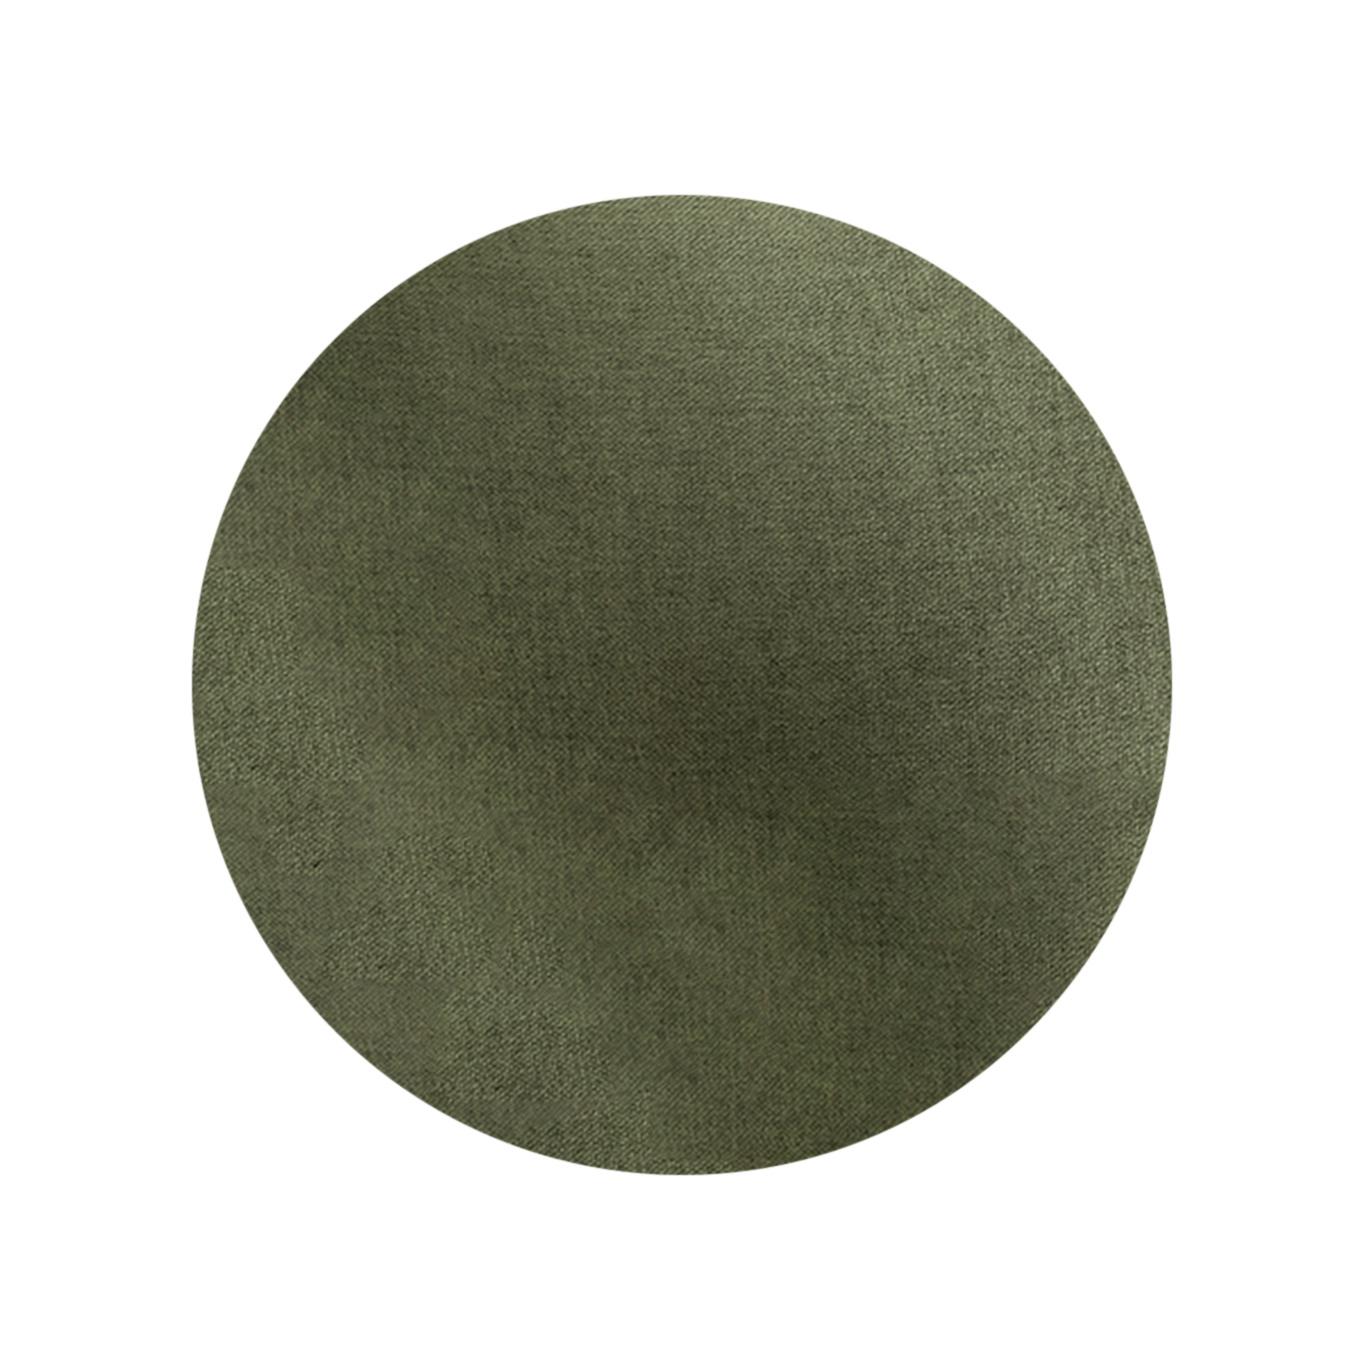 Distressed Velvet - Beetle Green